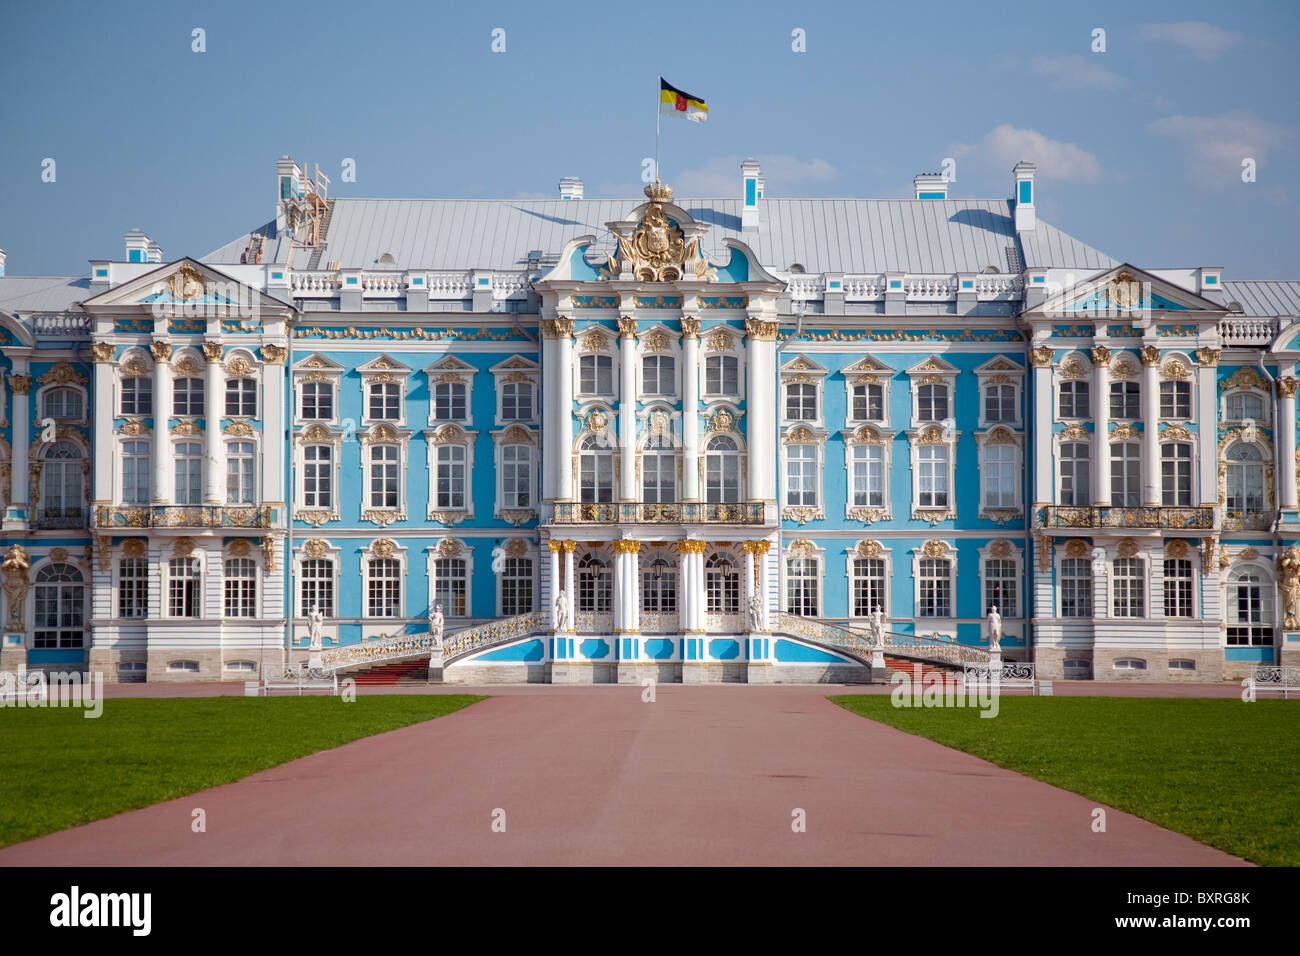 Catherine palace, Pushkin (Tsarskoe selo), Saint-Petersburg, Russia - Stock Image